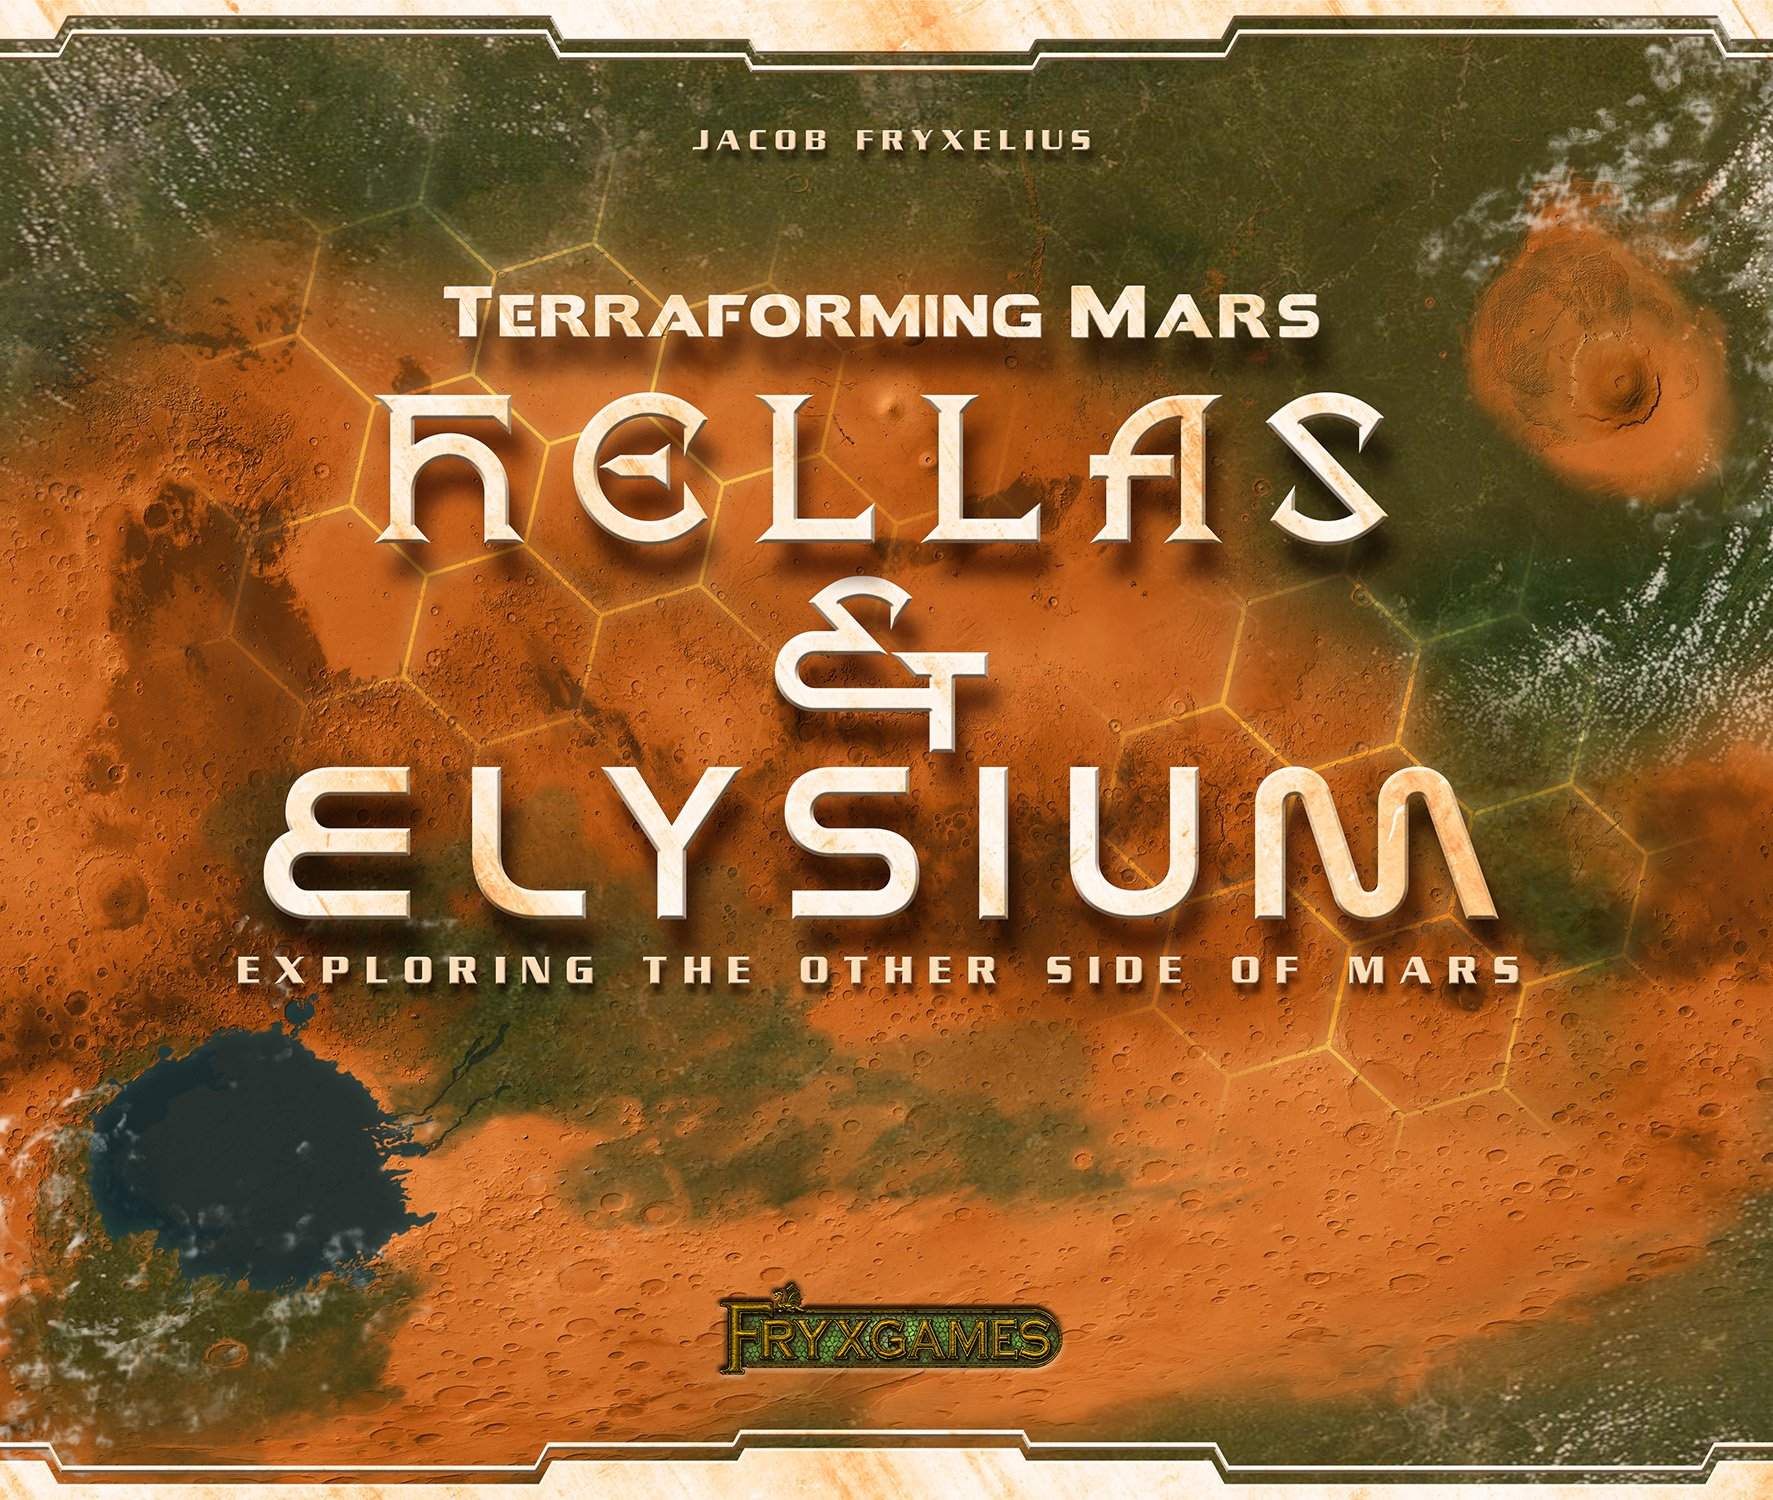 Terraforming Mars: Hellas & Elysium (Expansion)